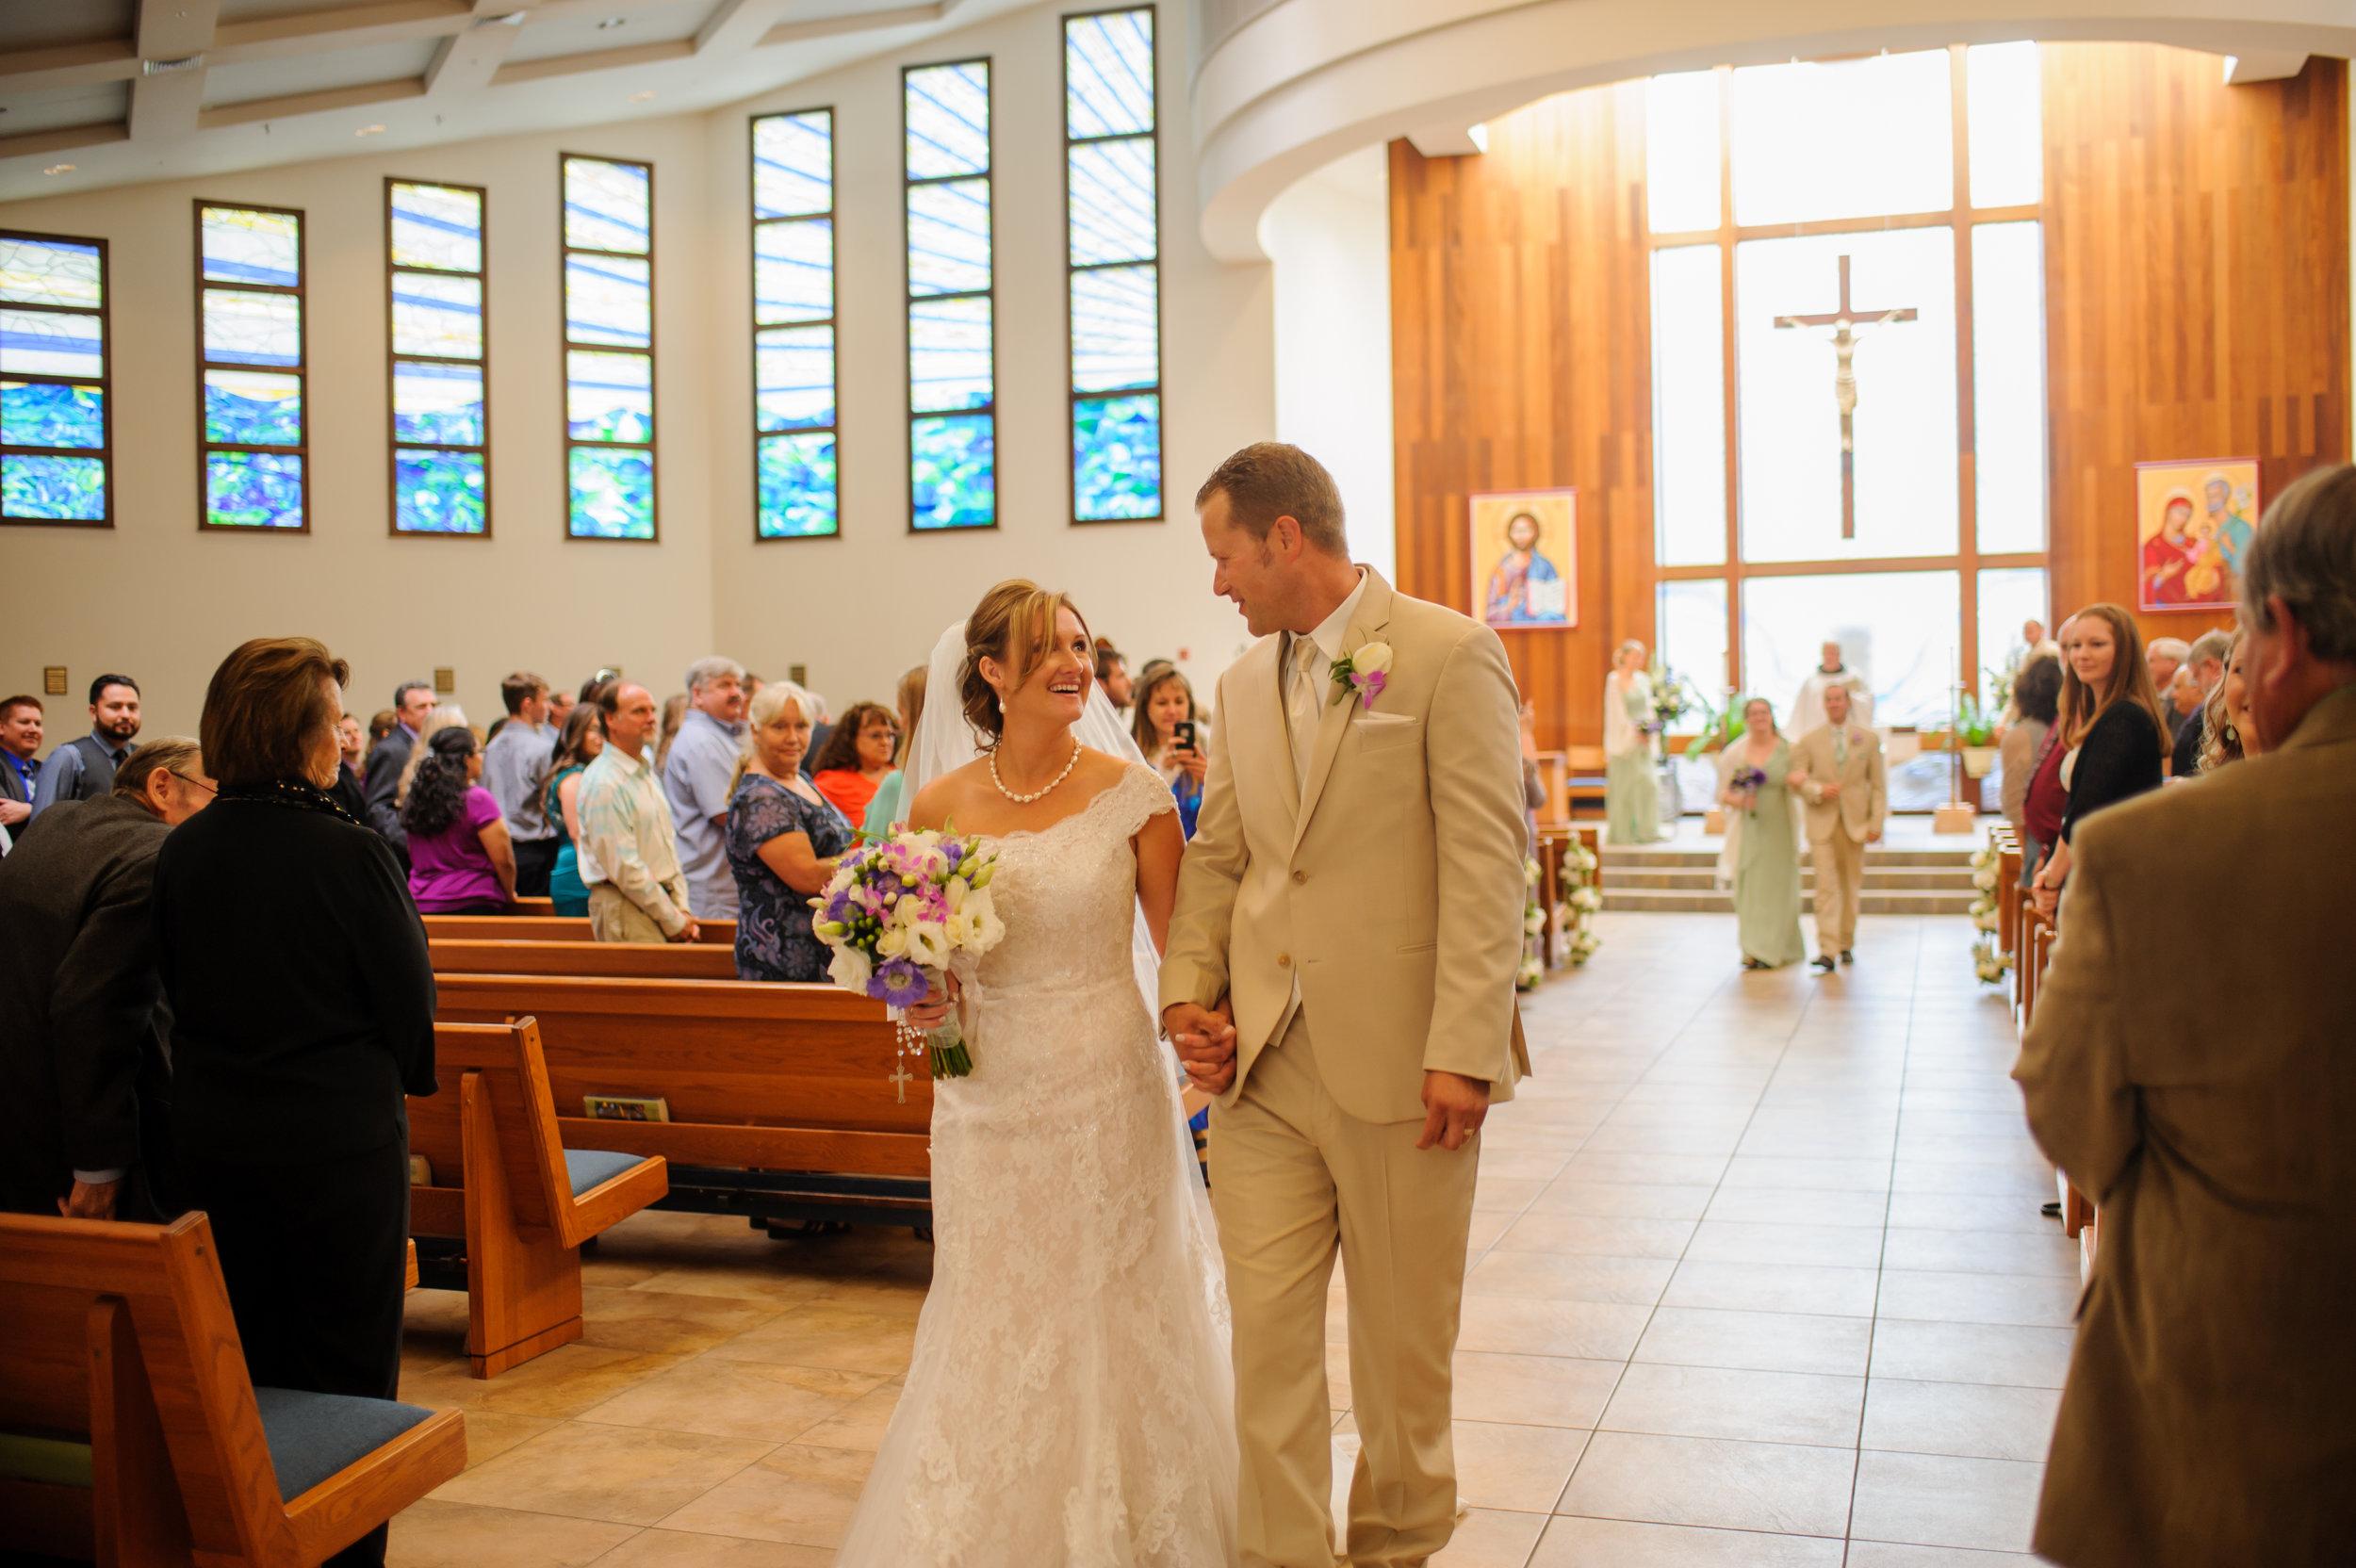 danielle-ross-012-sacramento-wedding-photographer-katherine-nicole-photography.JPG